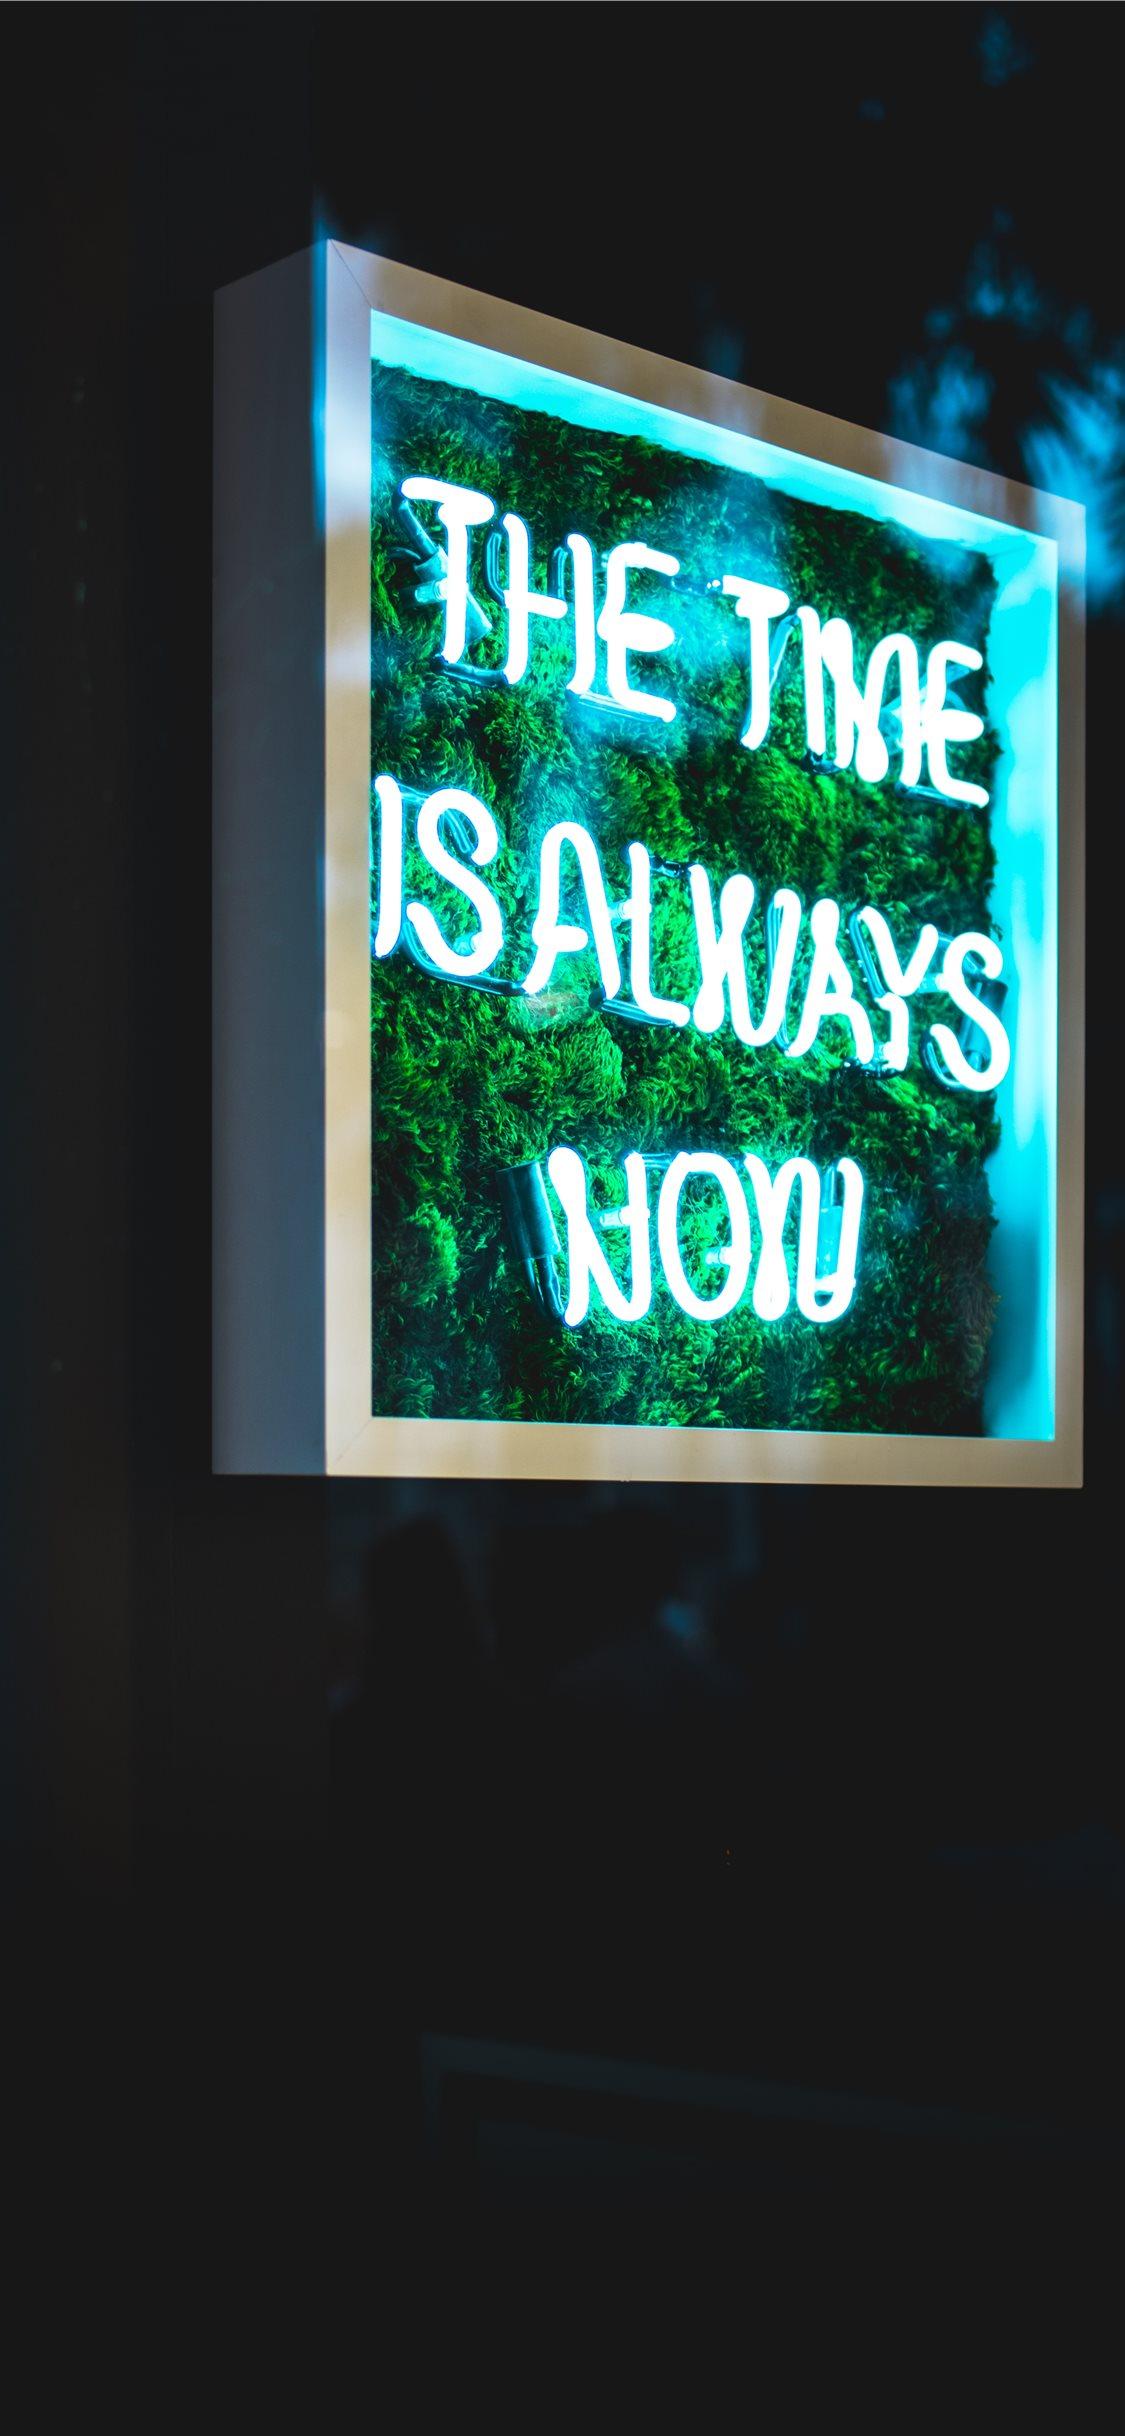 Neon Light Iphone Xs - HD Wallpaper